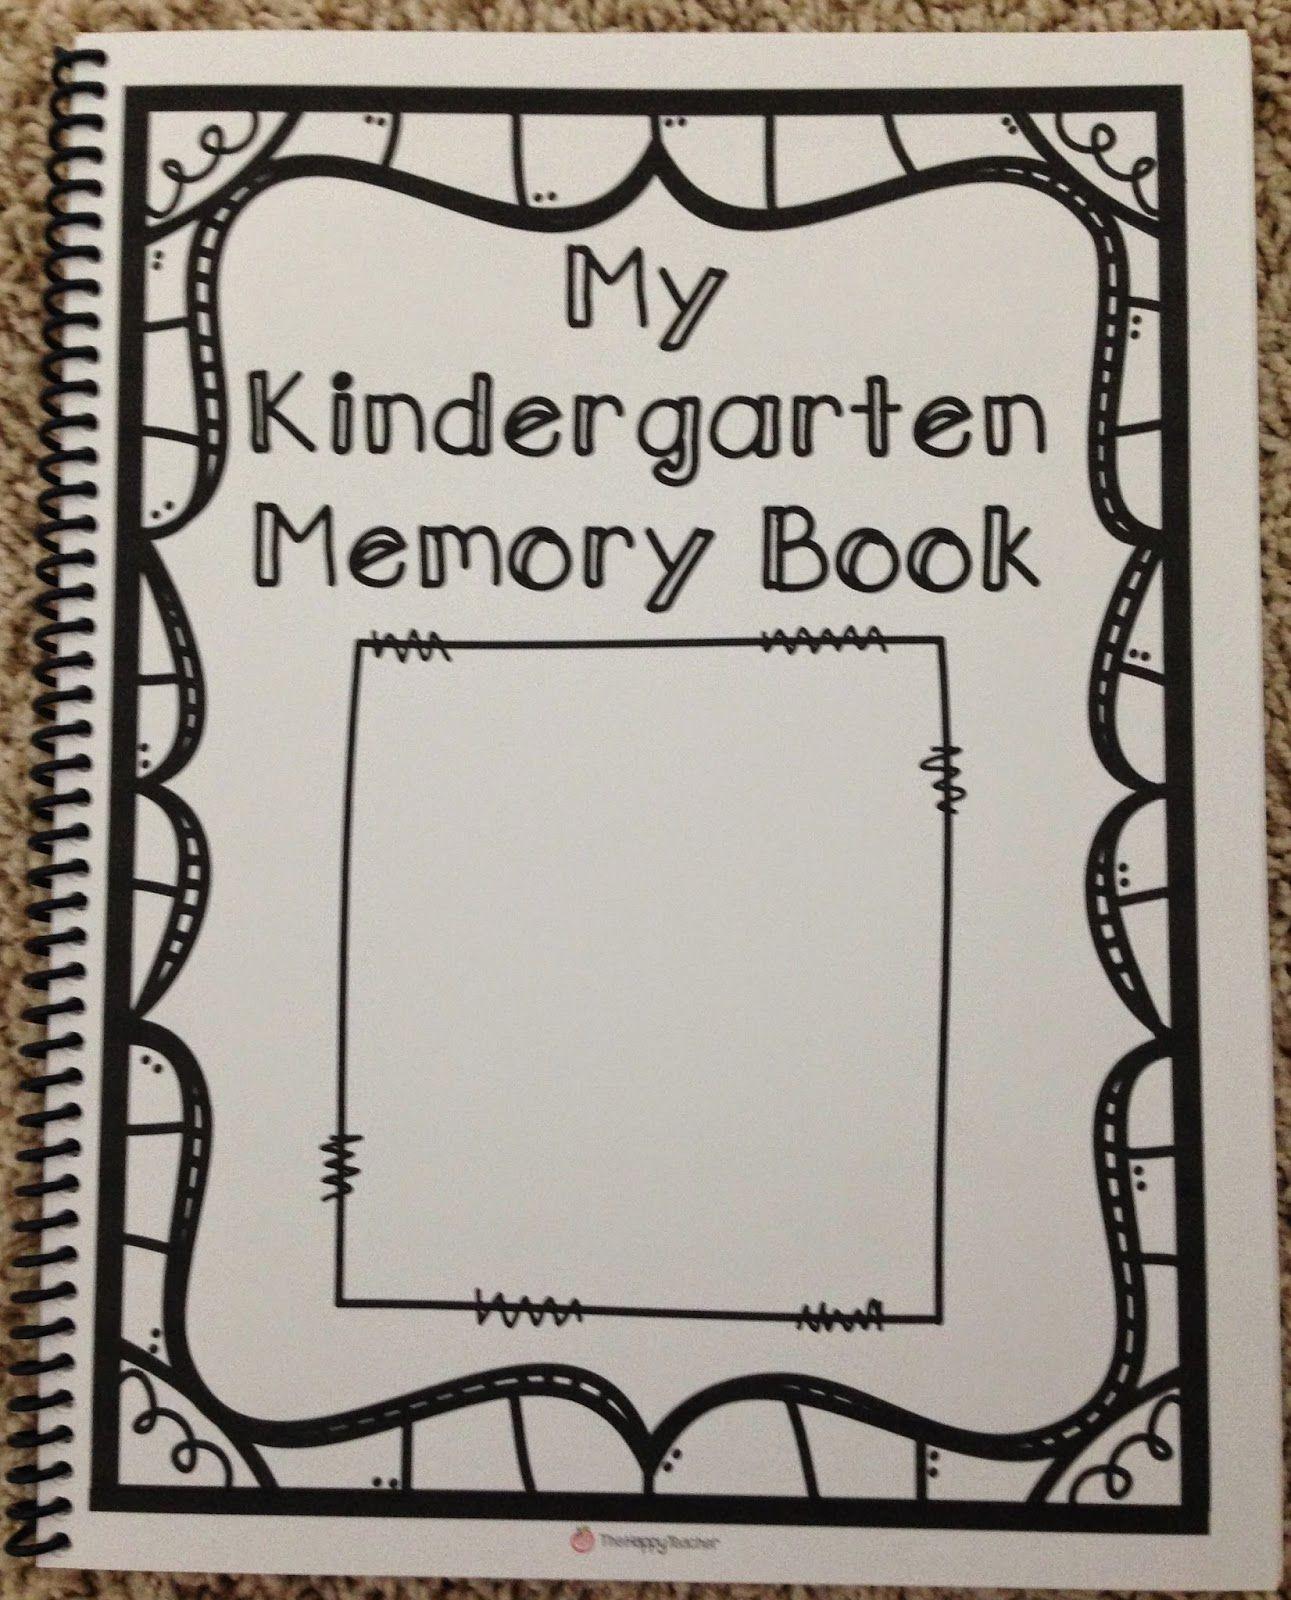 Kindergarten Memory Book | Kindergartenklub | Pinterest - Free Printable Preschool Memory Book